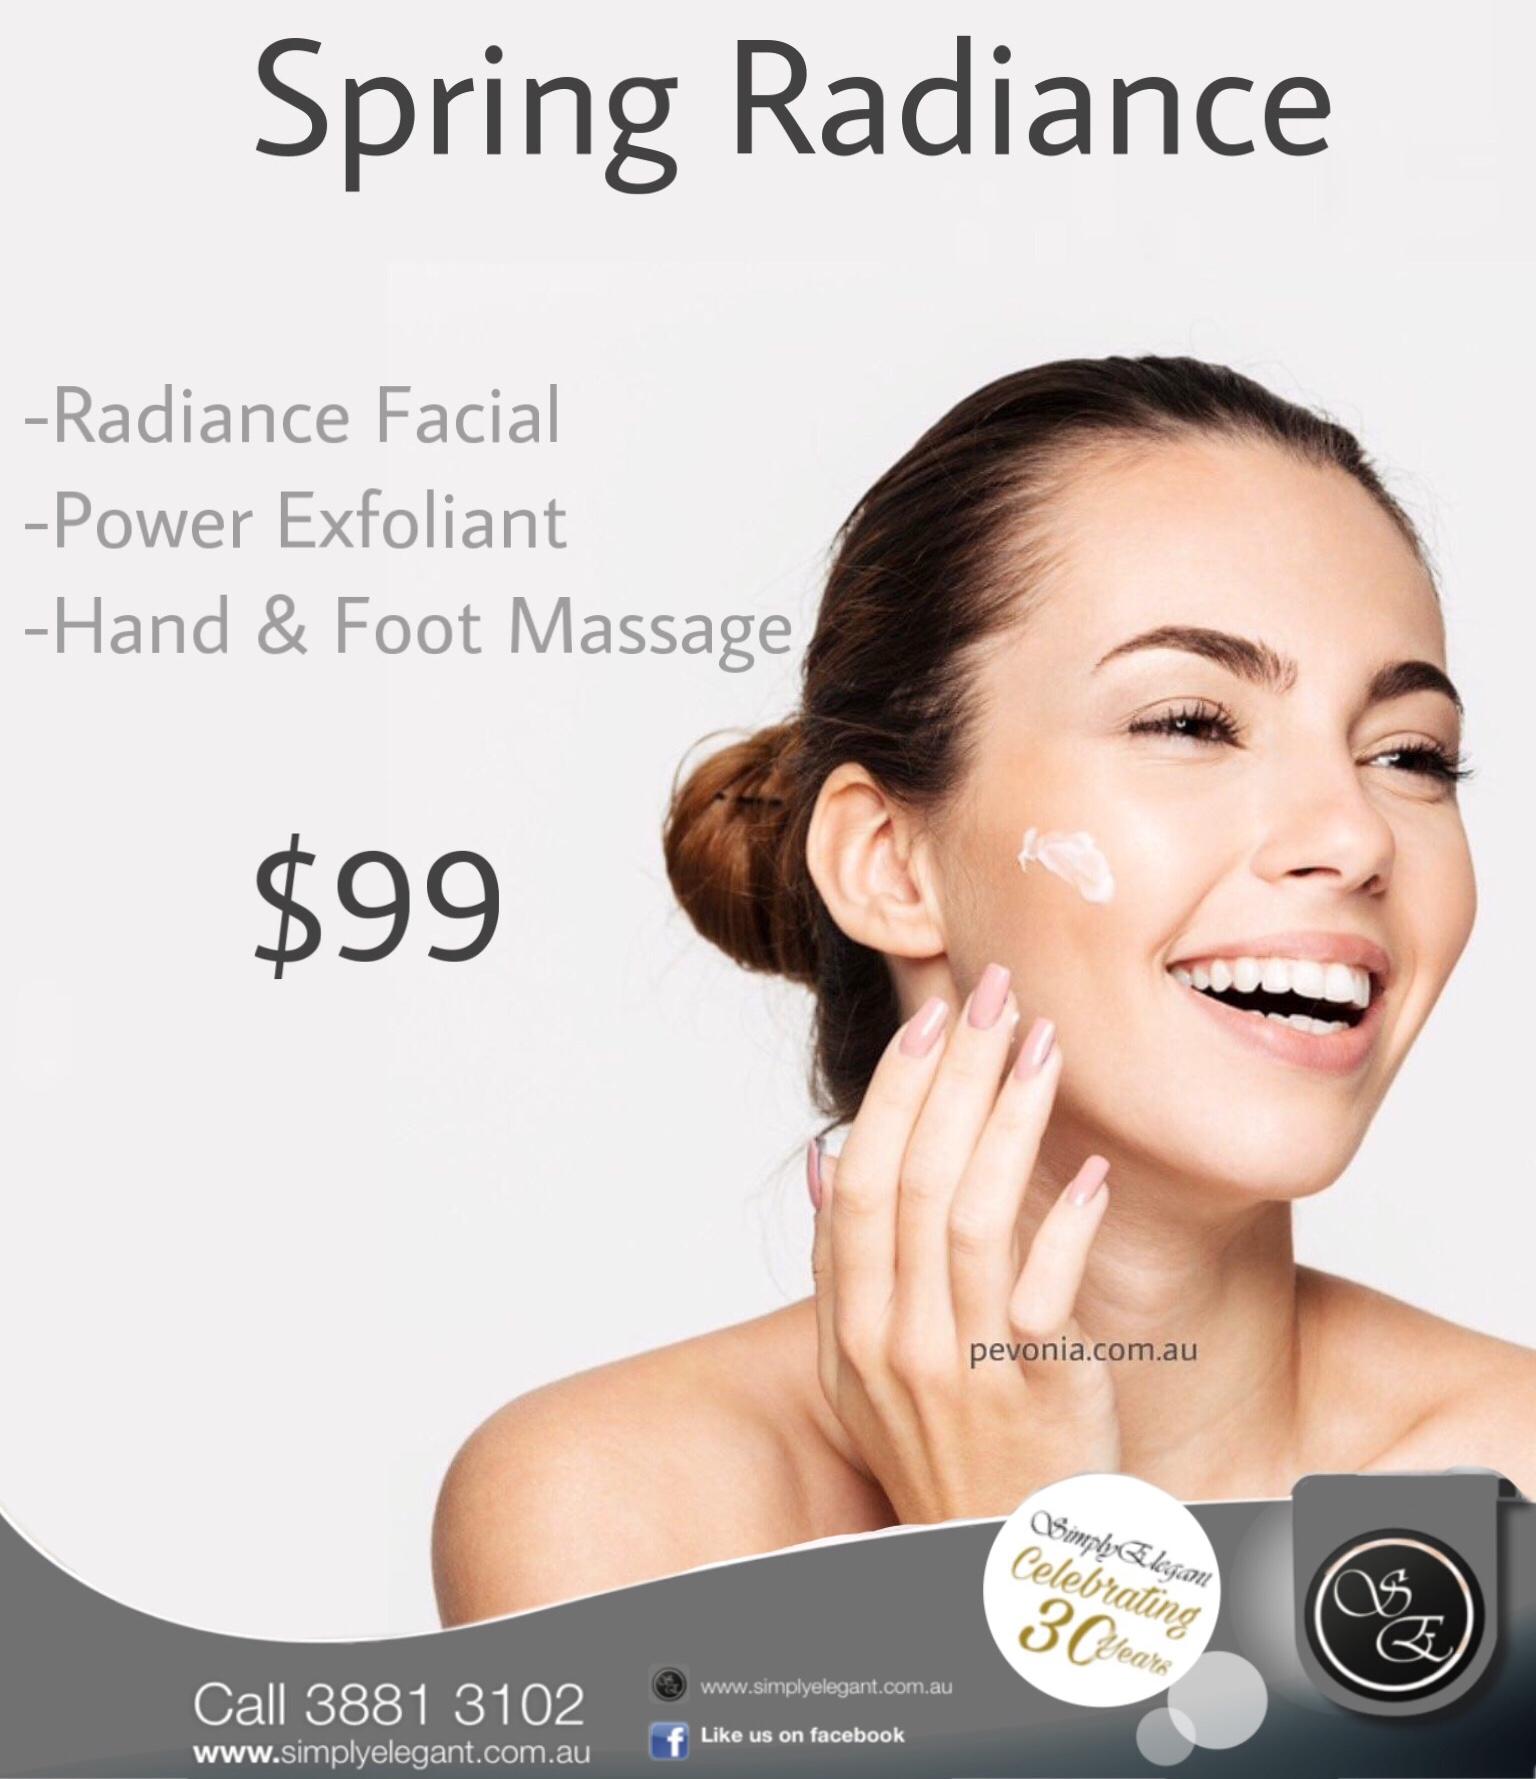 Spring Radiance Facial